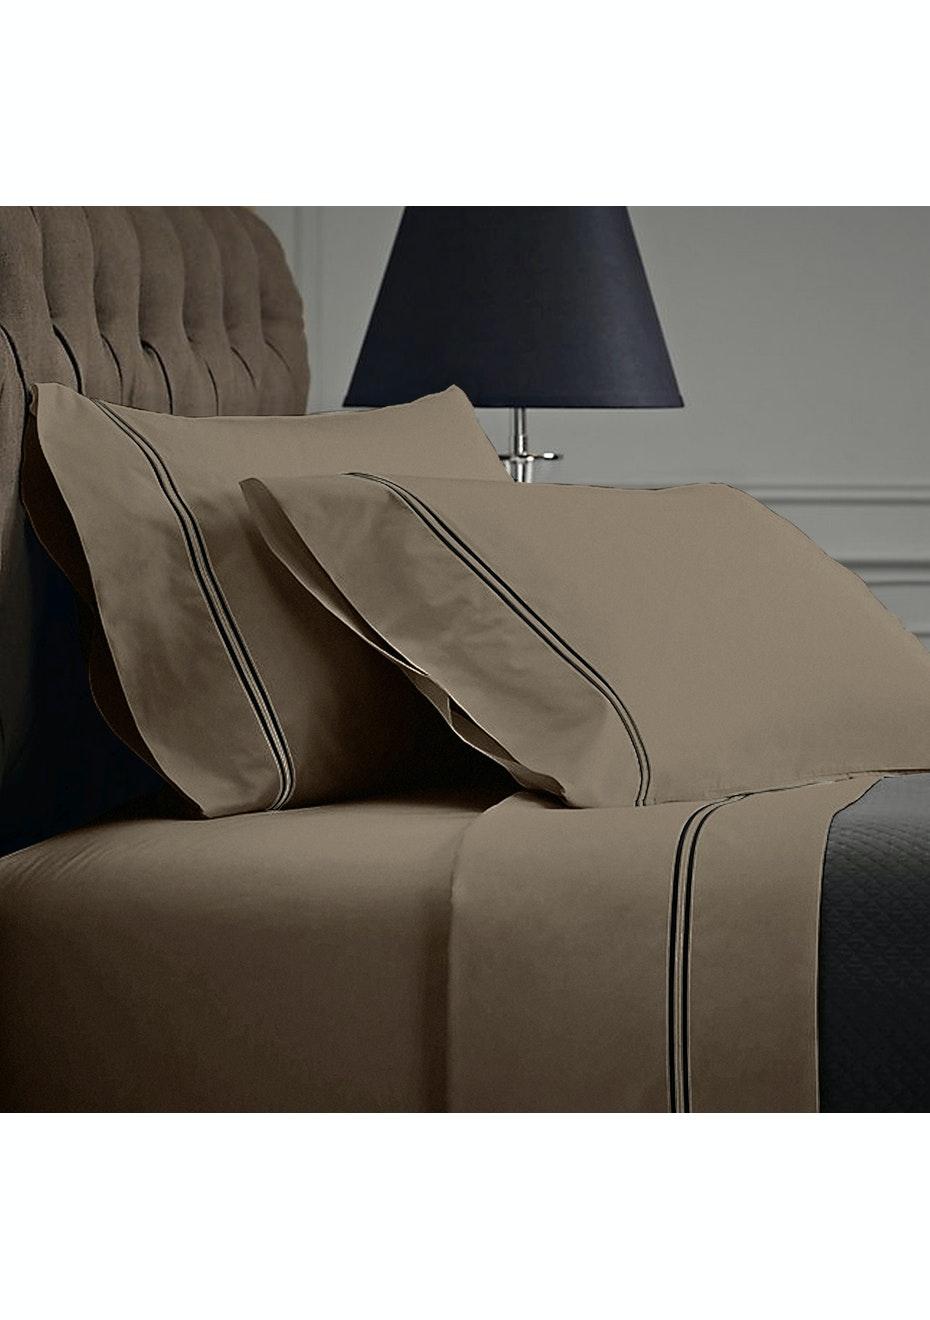 Style & Co 1000 Thread count Egyptian Cotton Hotel Collection Sorrento Sheet sets Mega Queen Linen